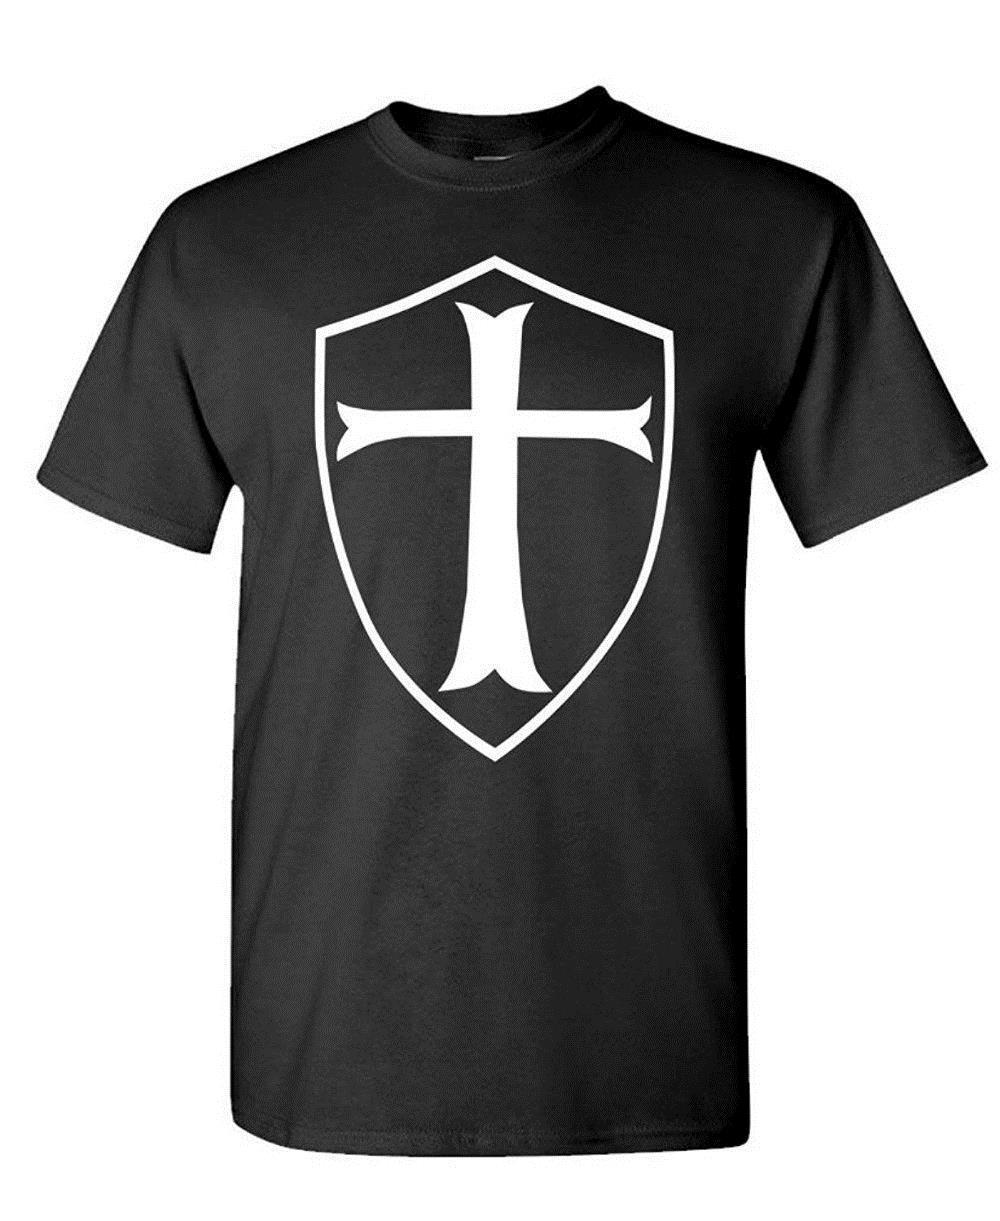 Custom T Shirts Cheap Cheap Shirts Print Short O Neck Mens Christian